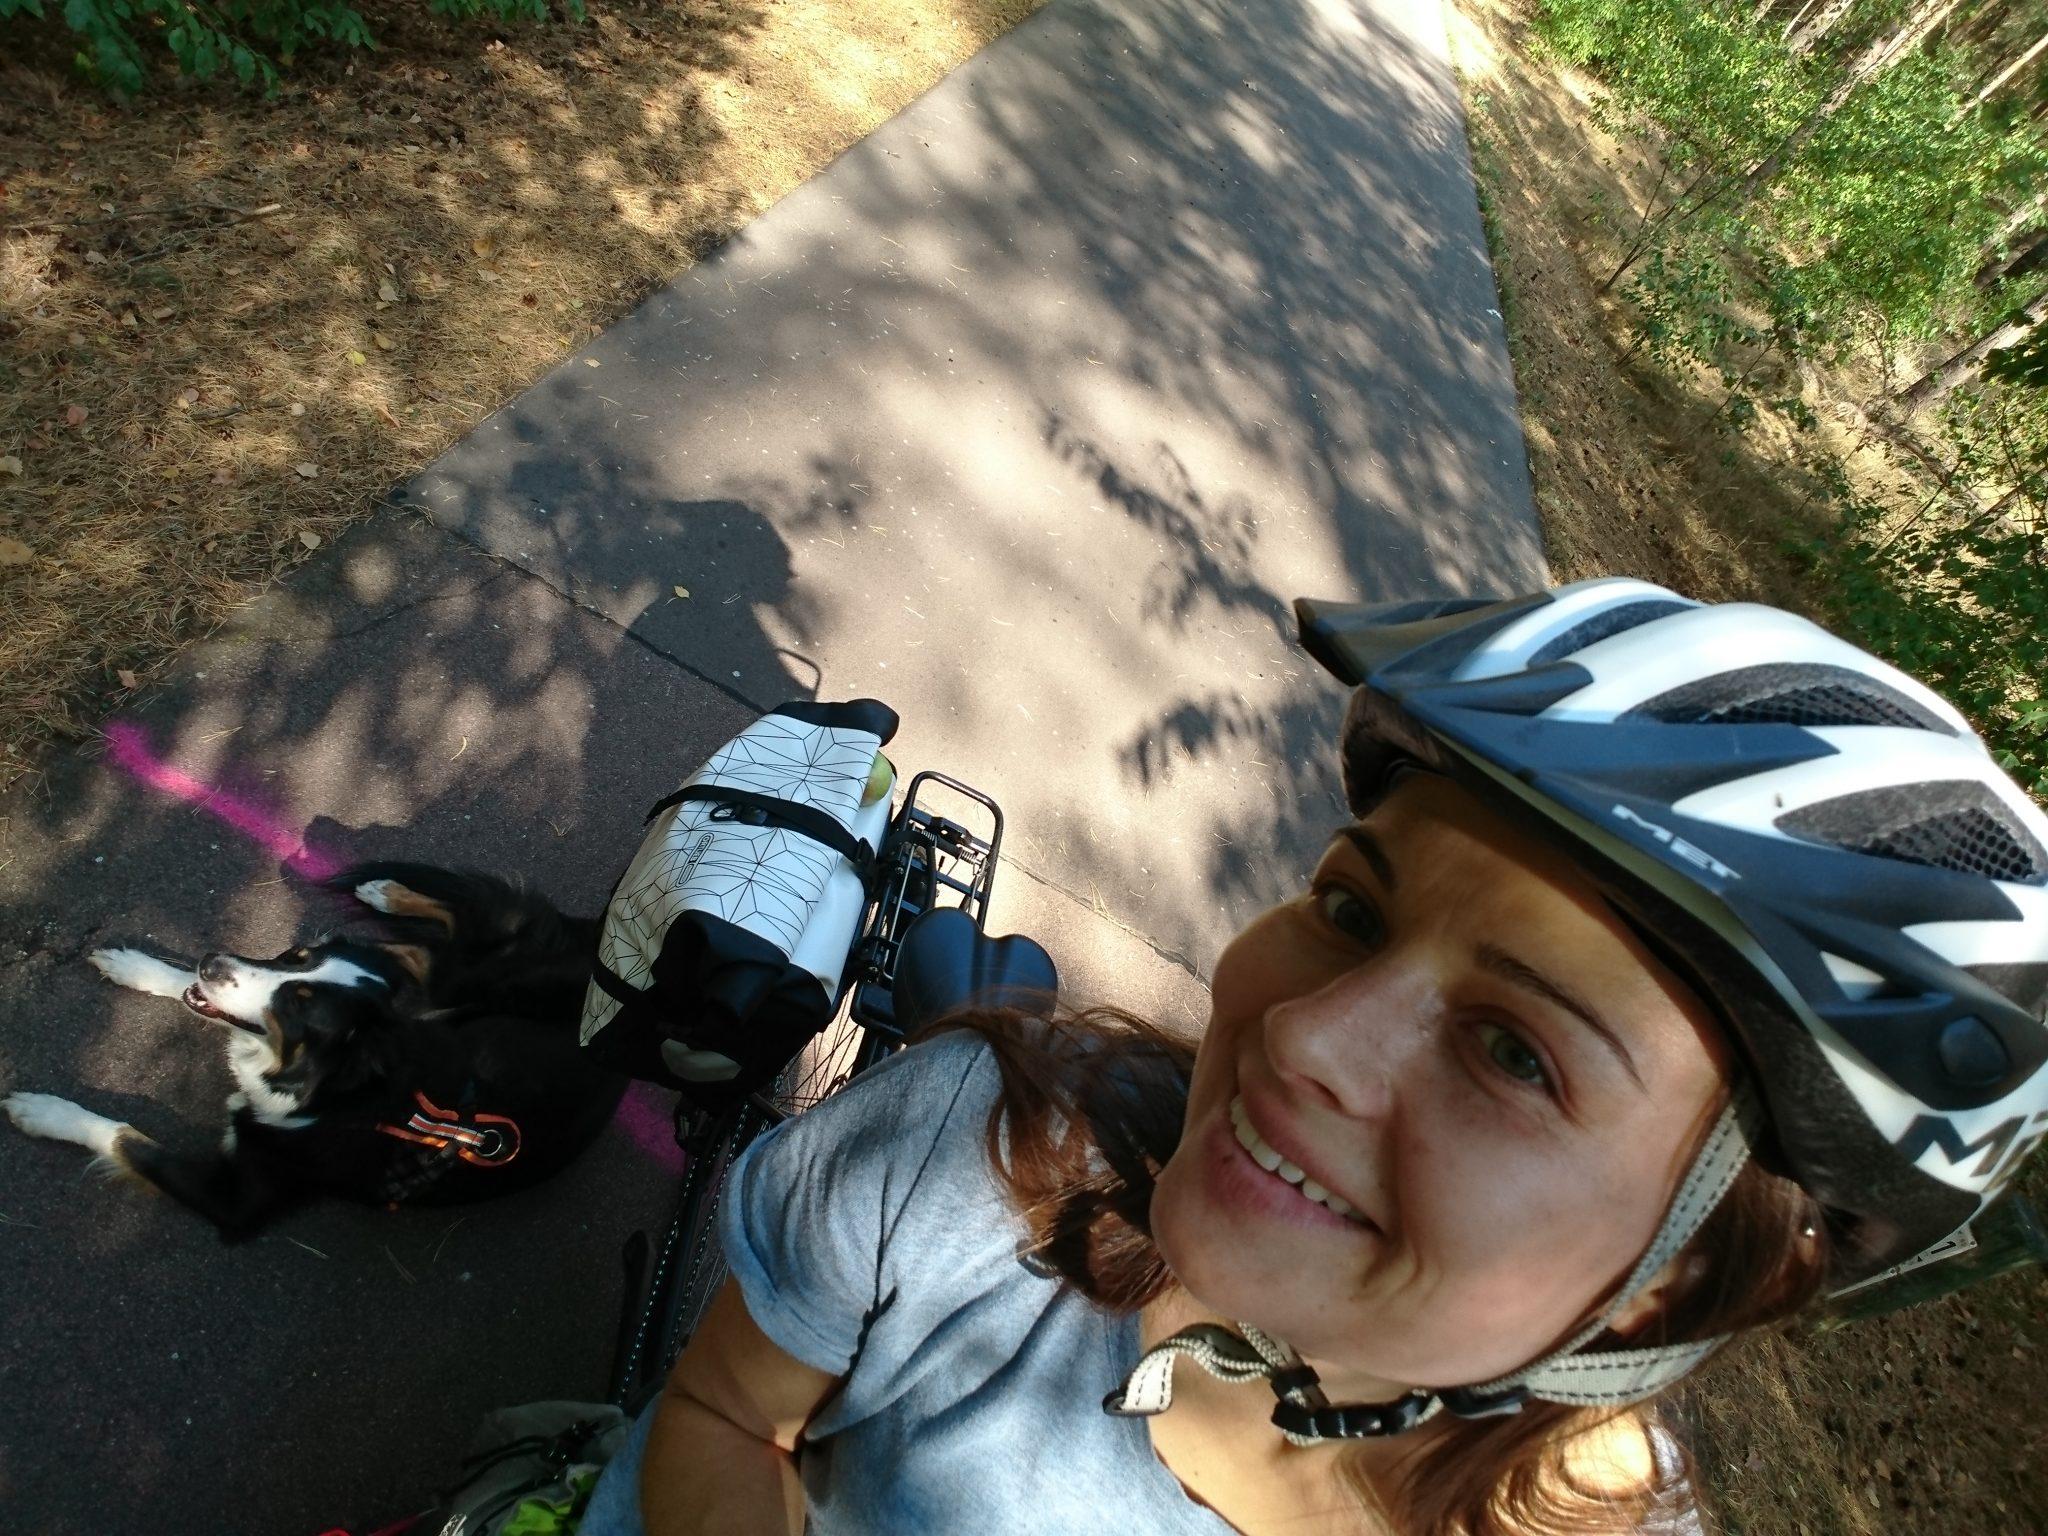 Fahrradtour Flaeming Skate Hund auf dem Radweg